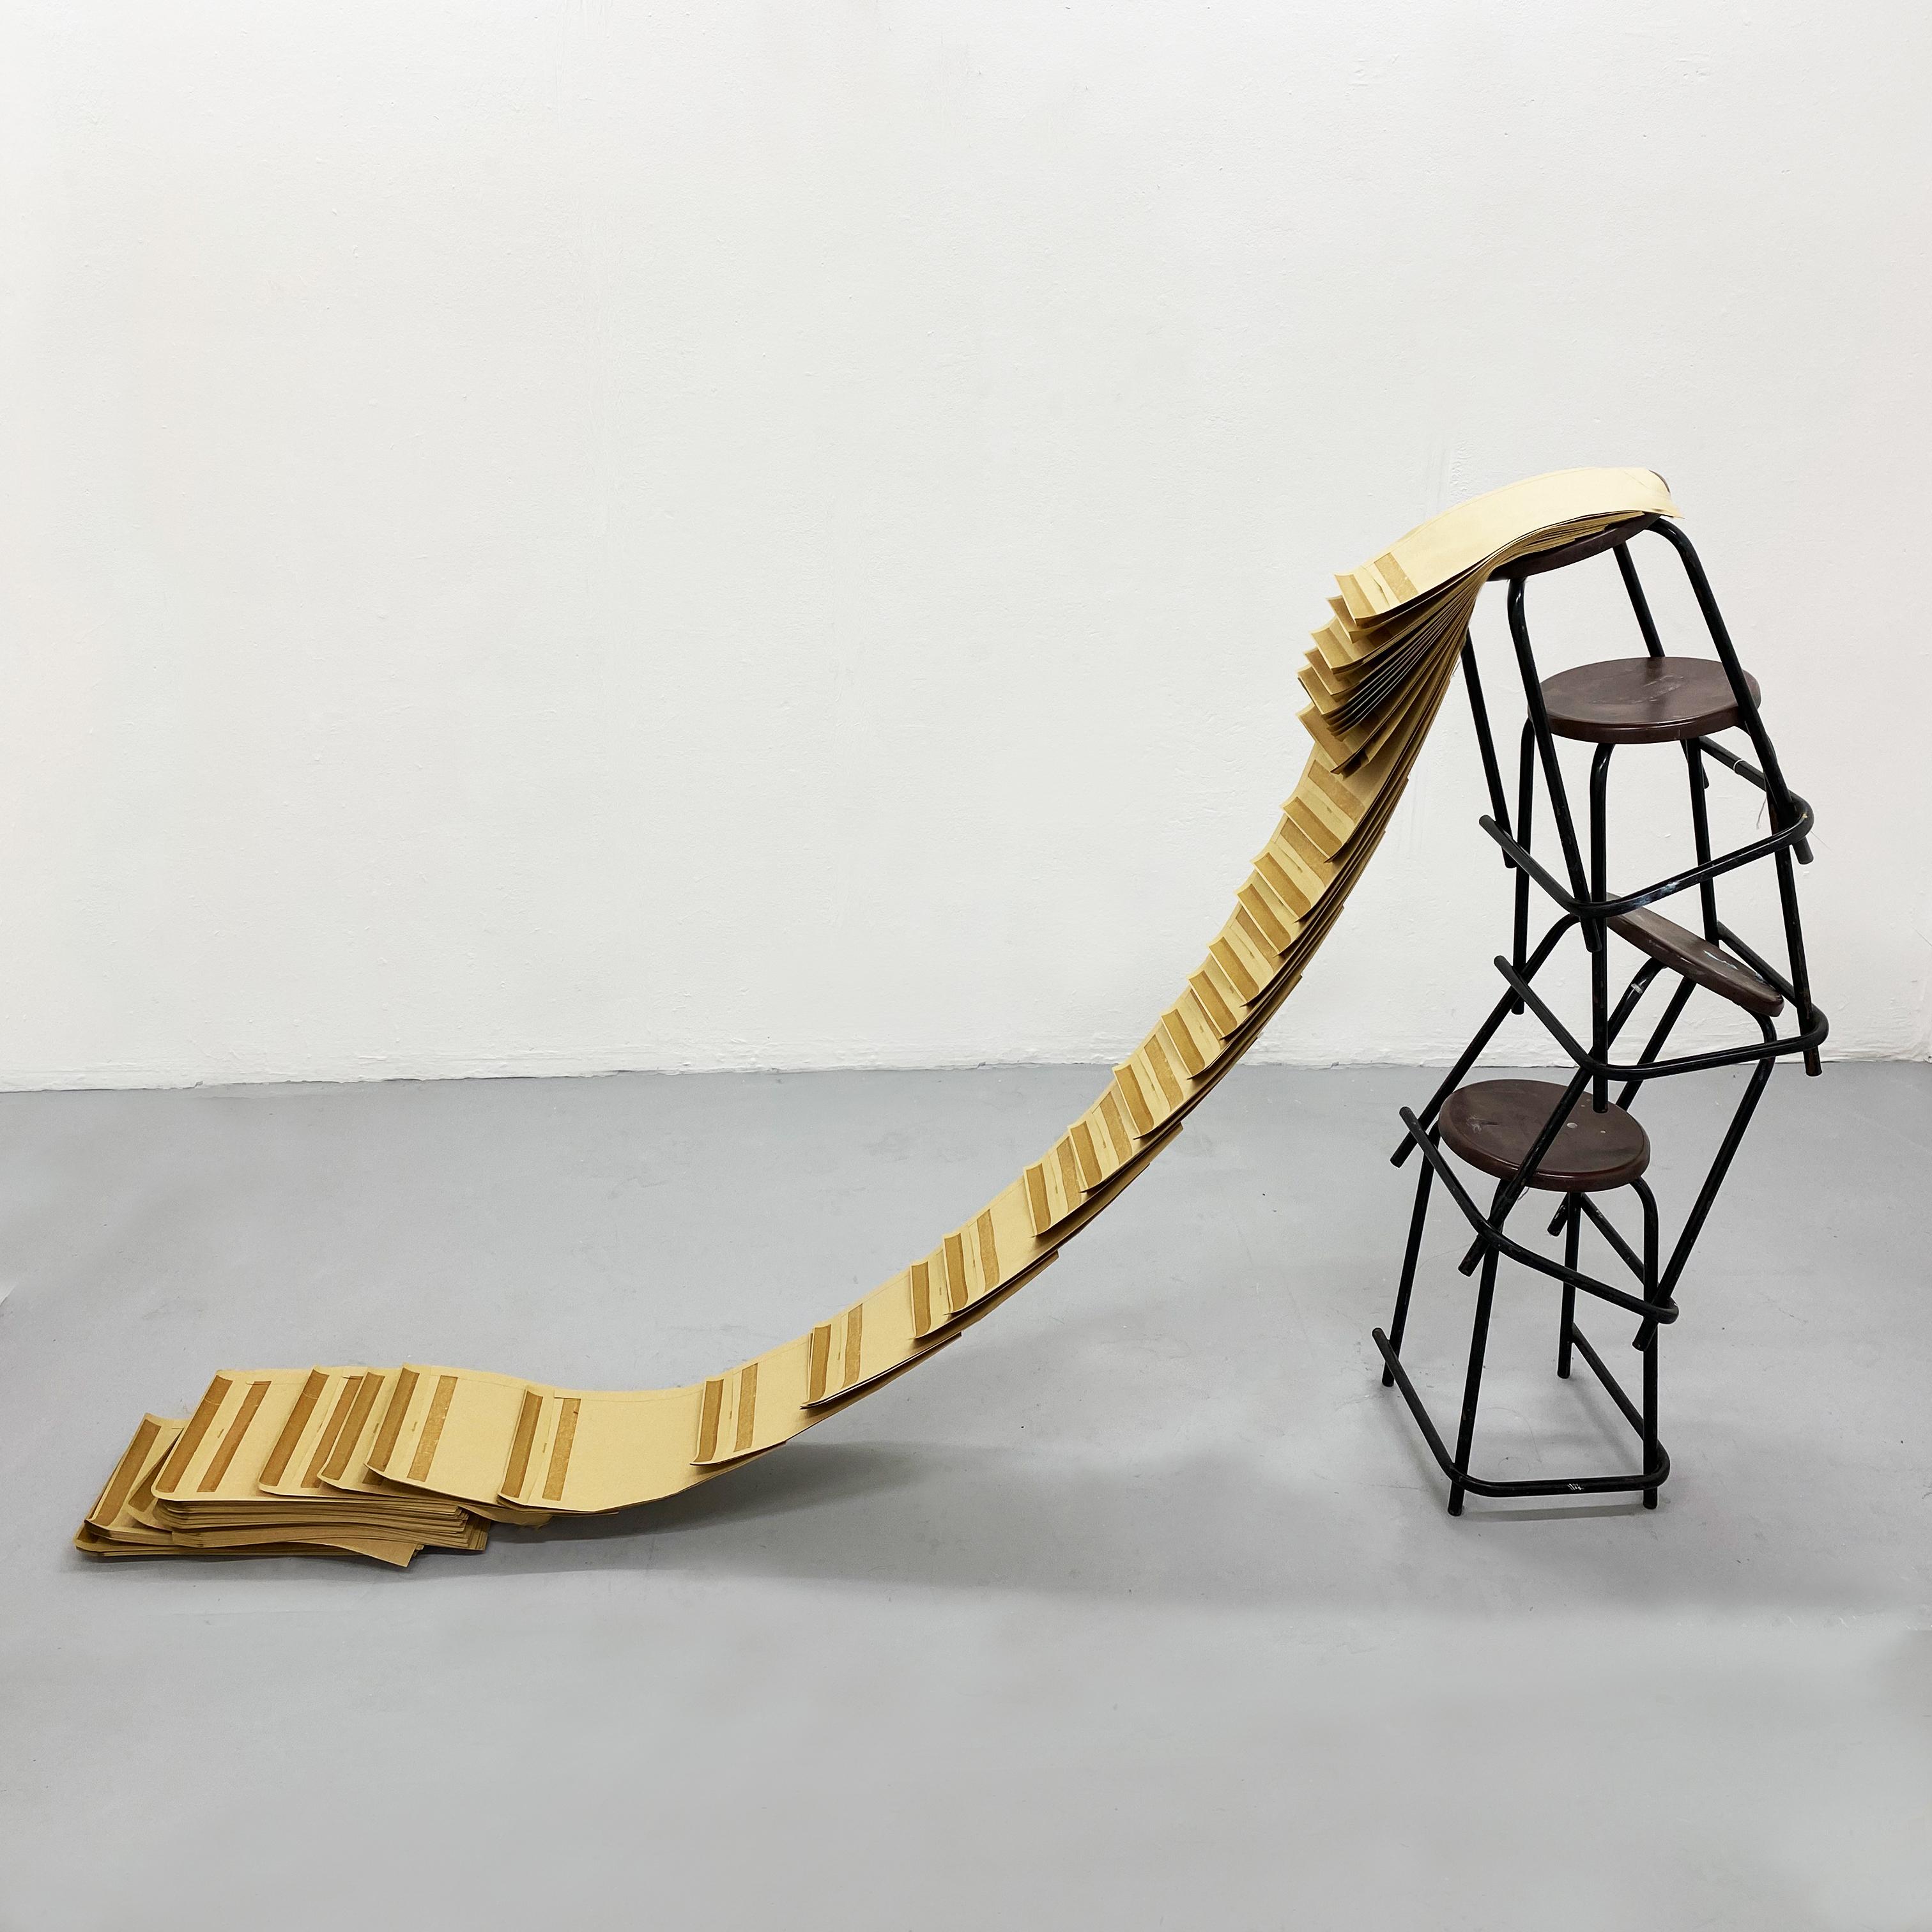 Spillage. 2020. Workshop stools and manilla envelopes.